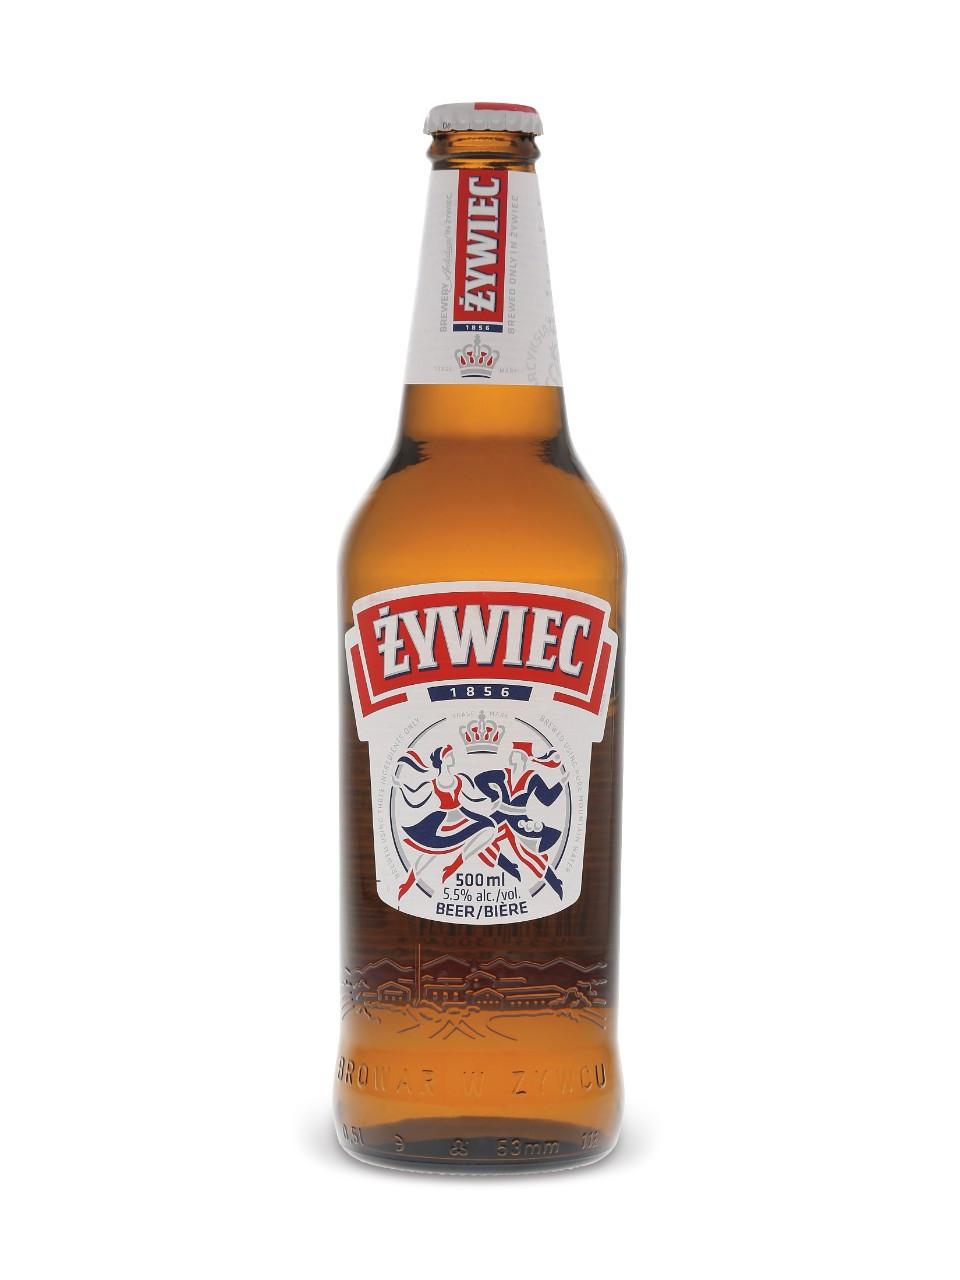 Zywiec beer  500 ml bottle